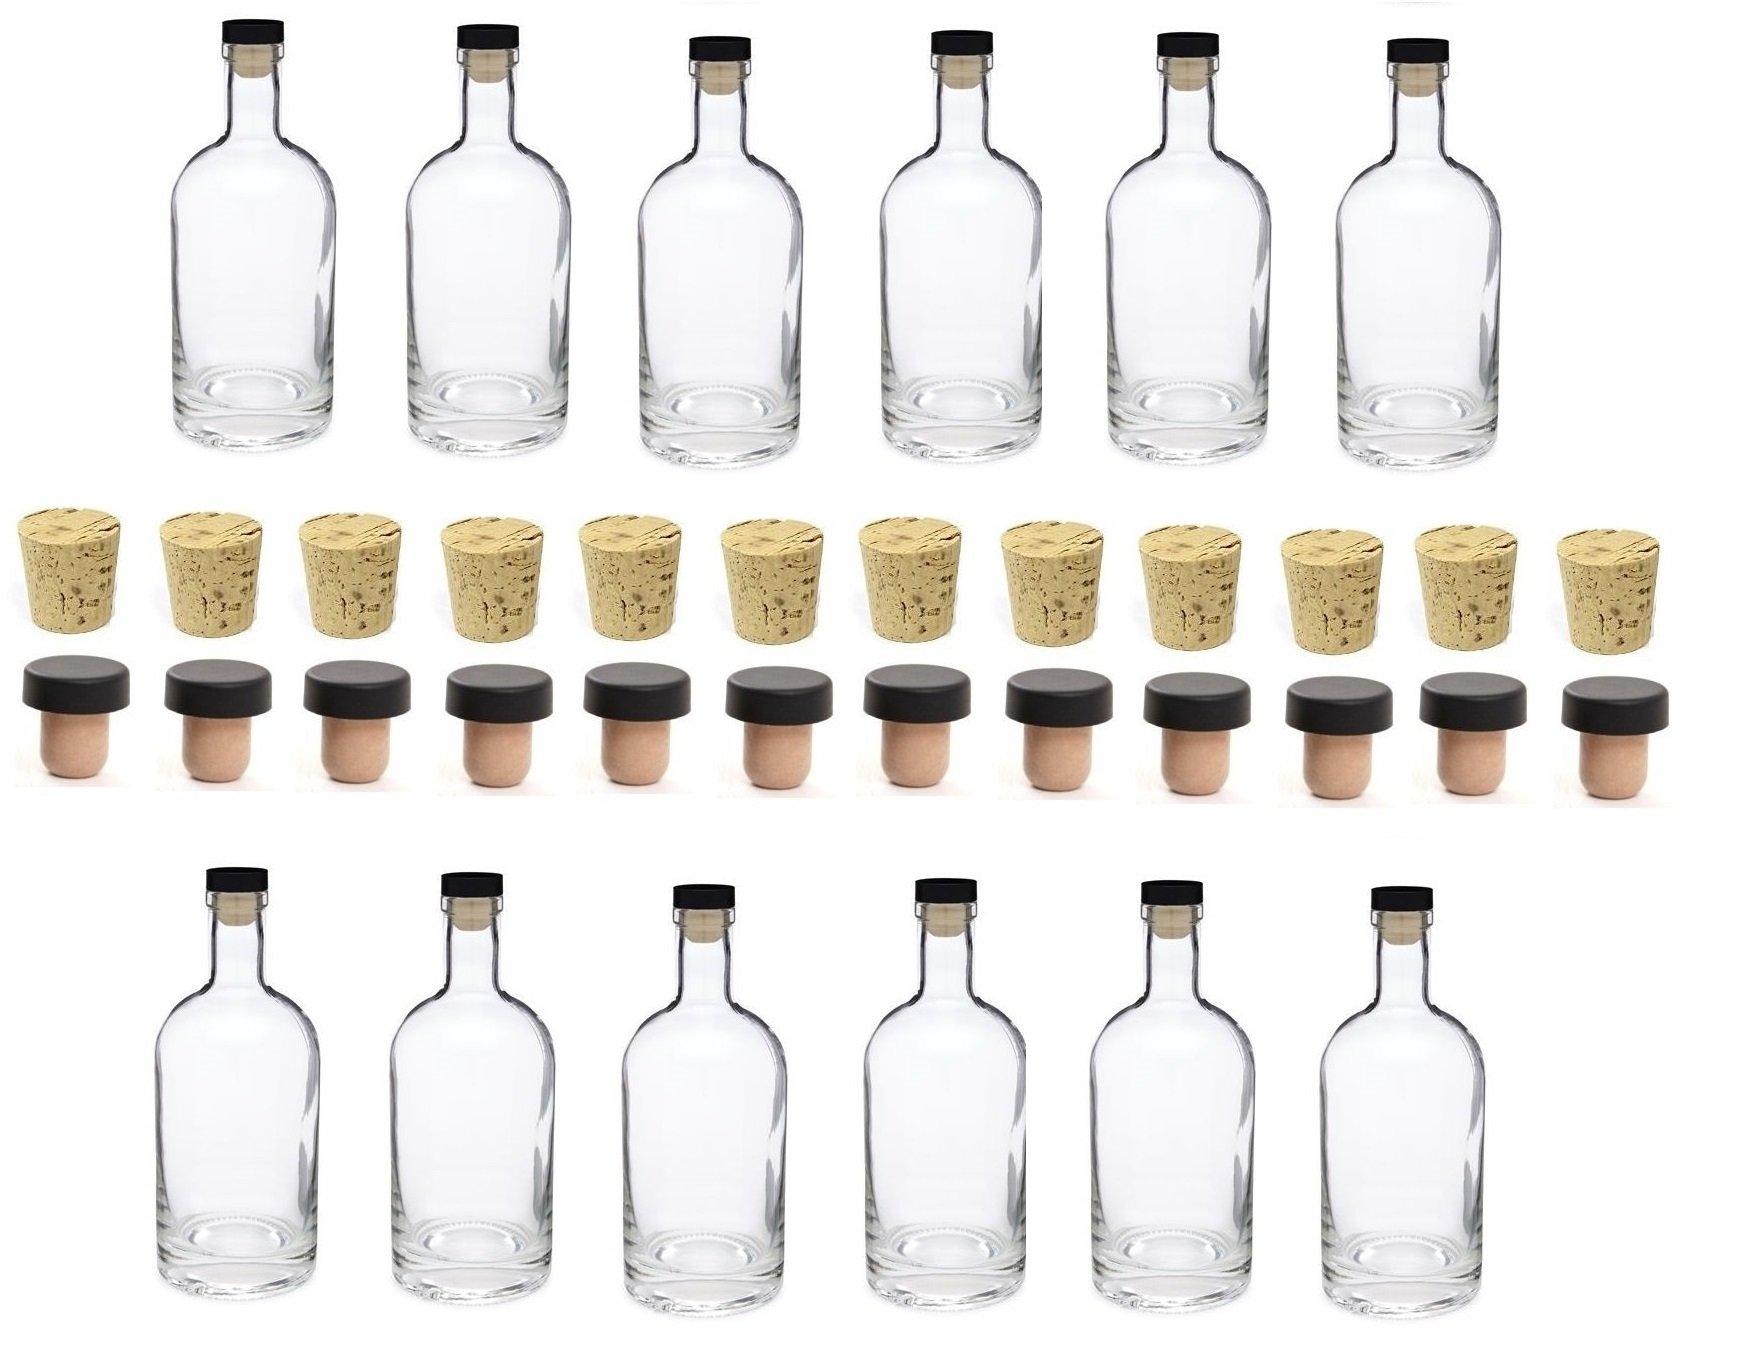 Nakpunar 12 pcs 25 oz Heavy Base Glass Liquor Bottle with T-Top Synthetic Stopper with Bonus Regular Bottle Cork - 750 ml by Nakpunar